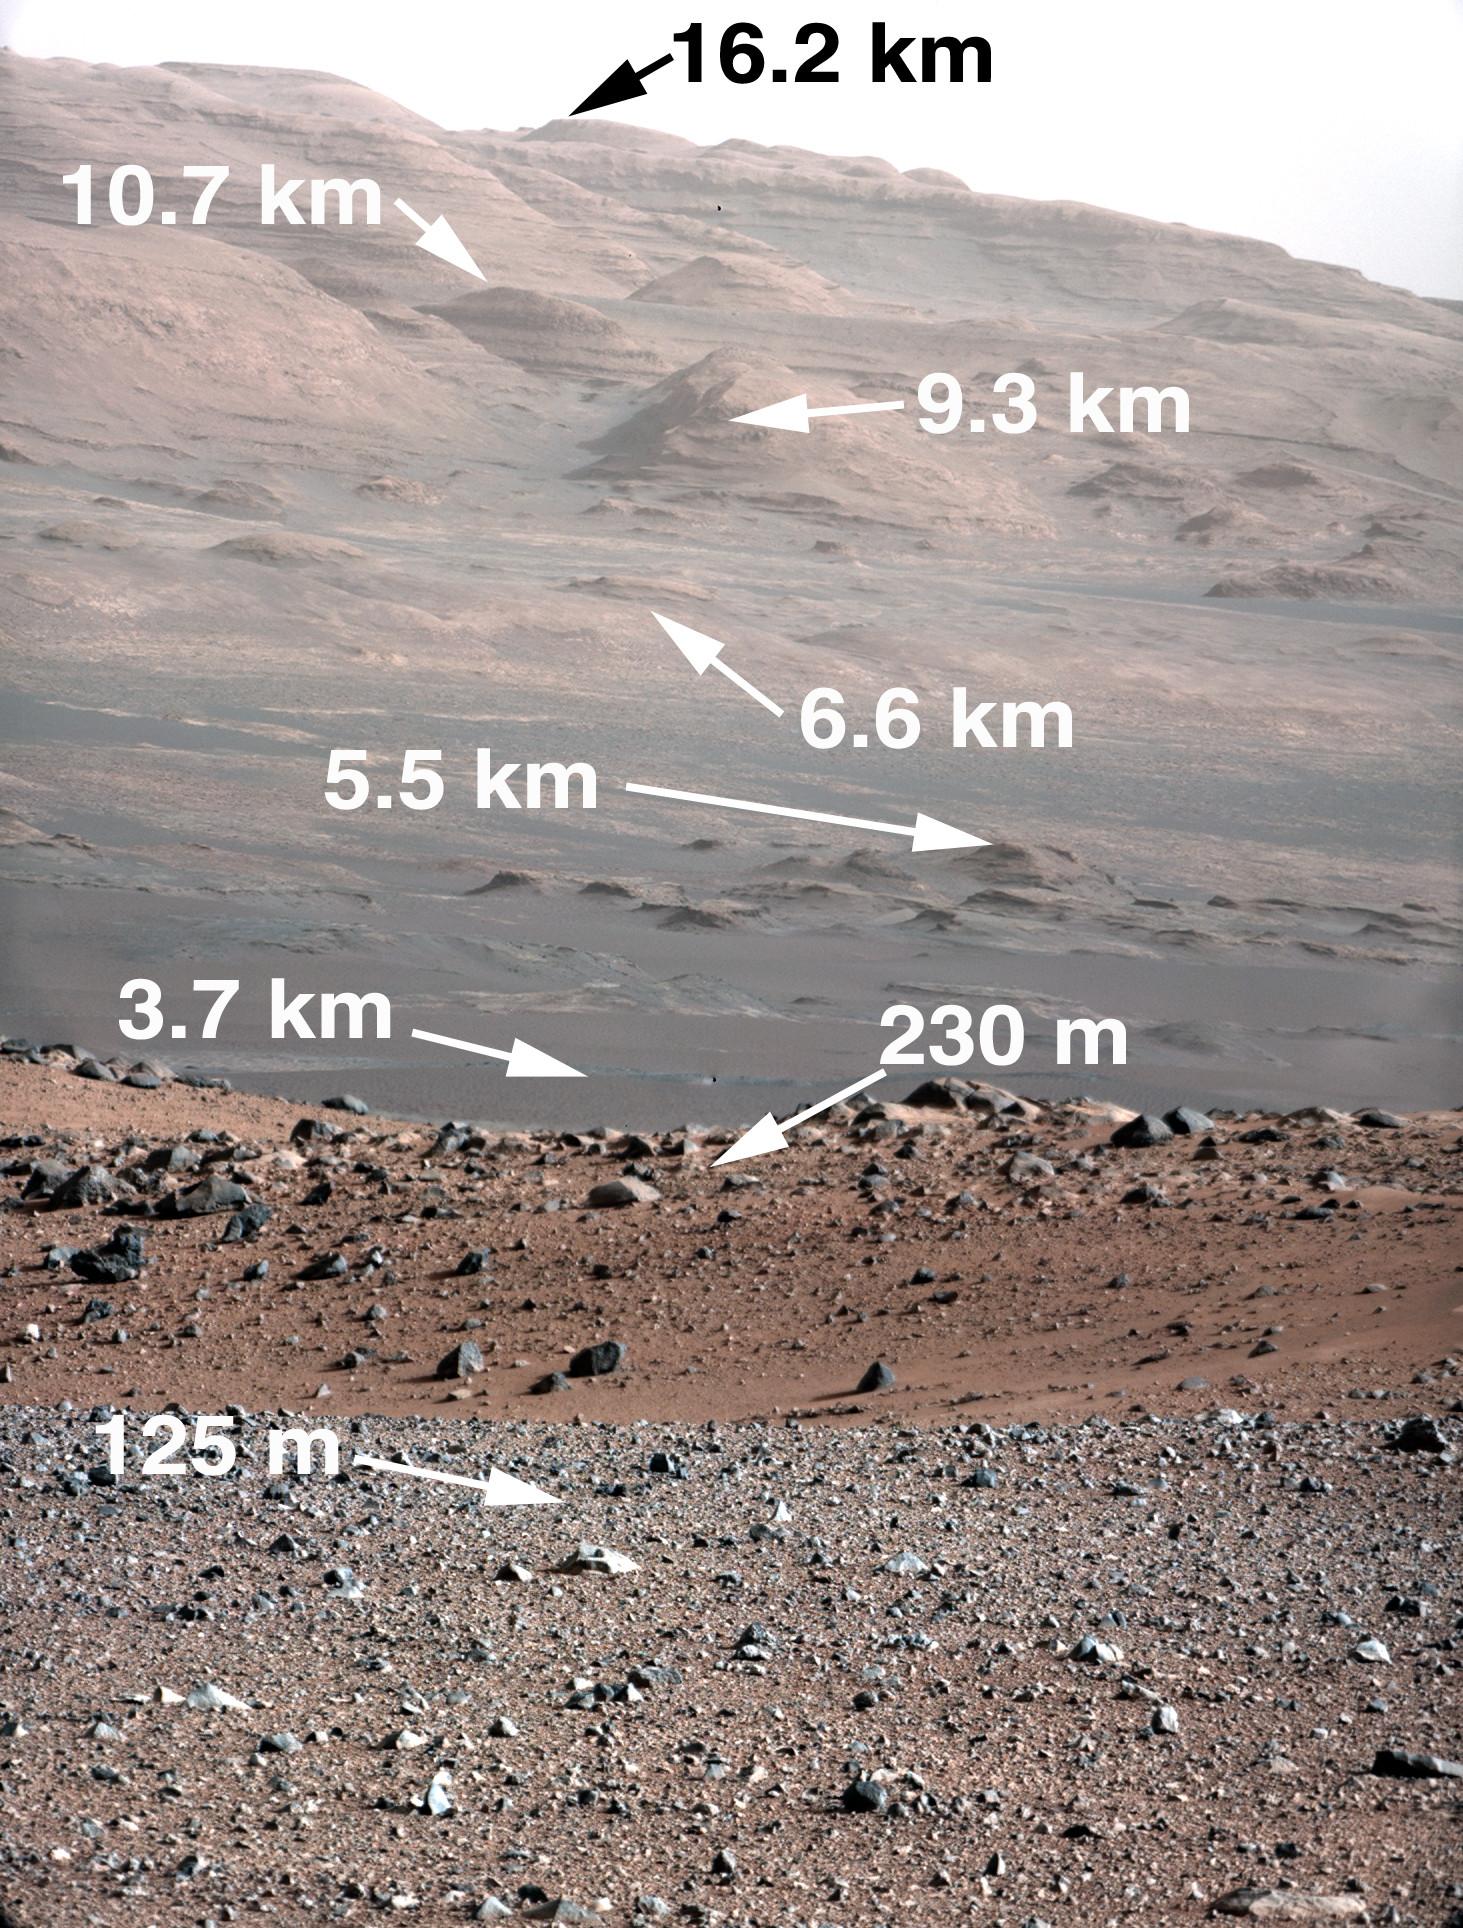 Res: 1463x1928, Desktop Wallpaper: Mars as seen by Curiosity